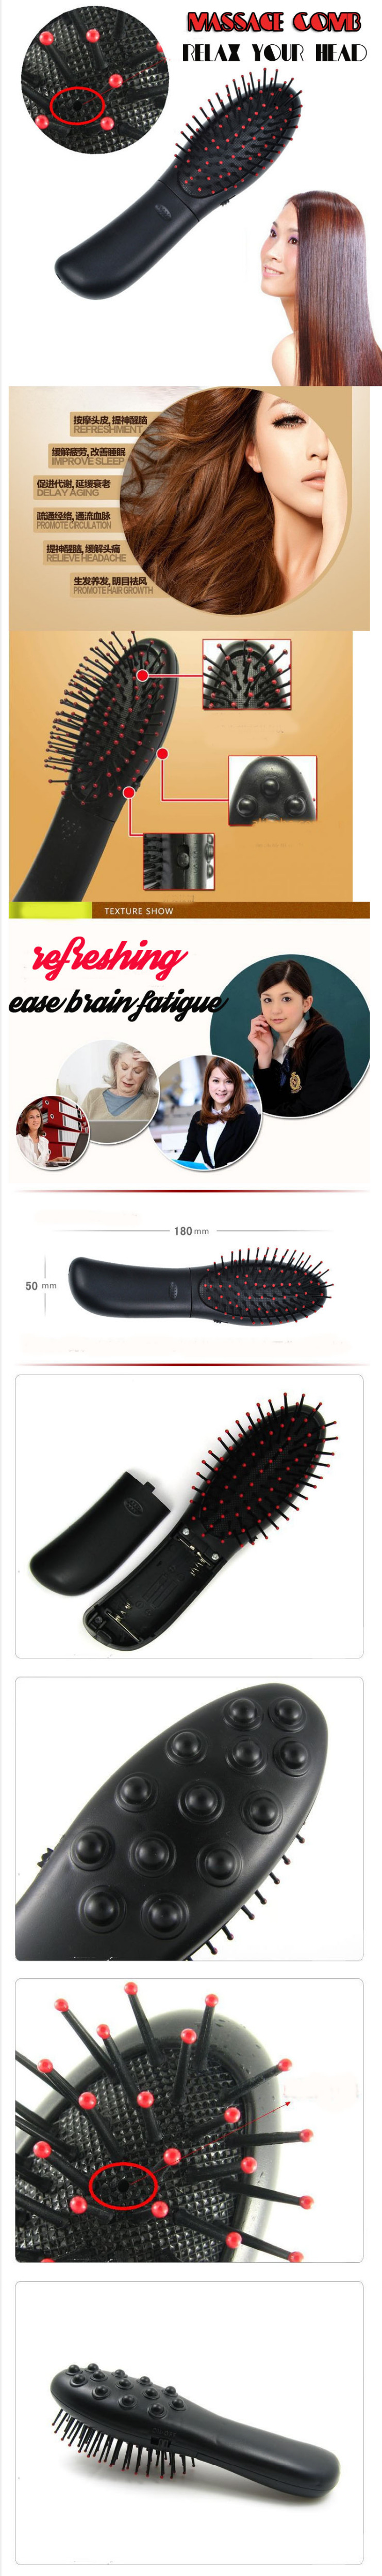 Vibrating Hair Brush Electric Scalp Massage